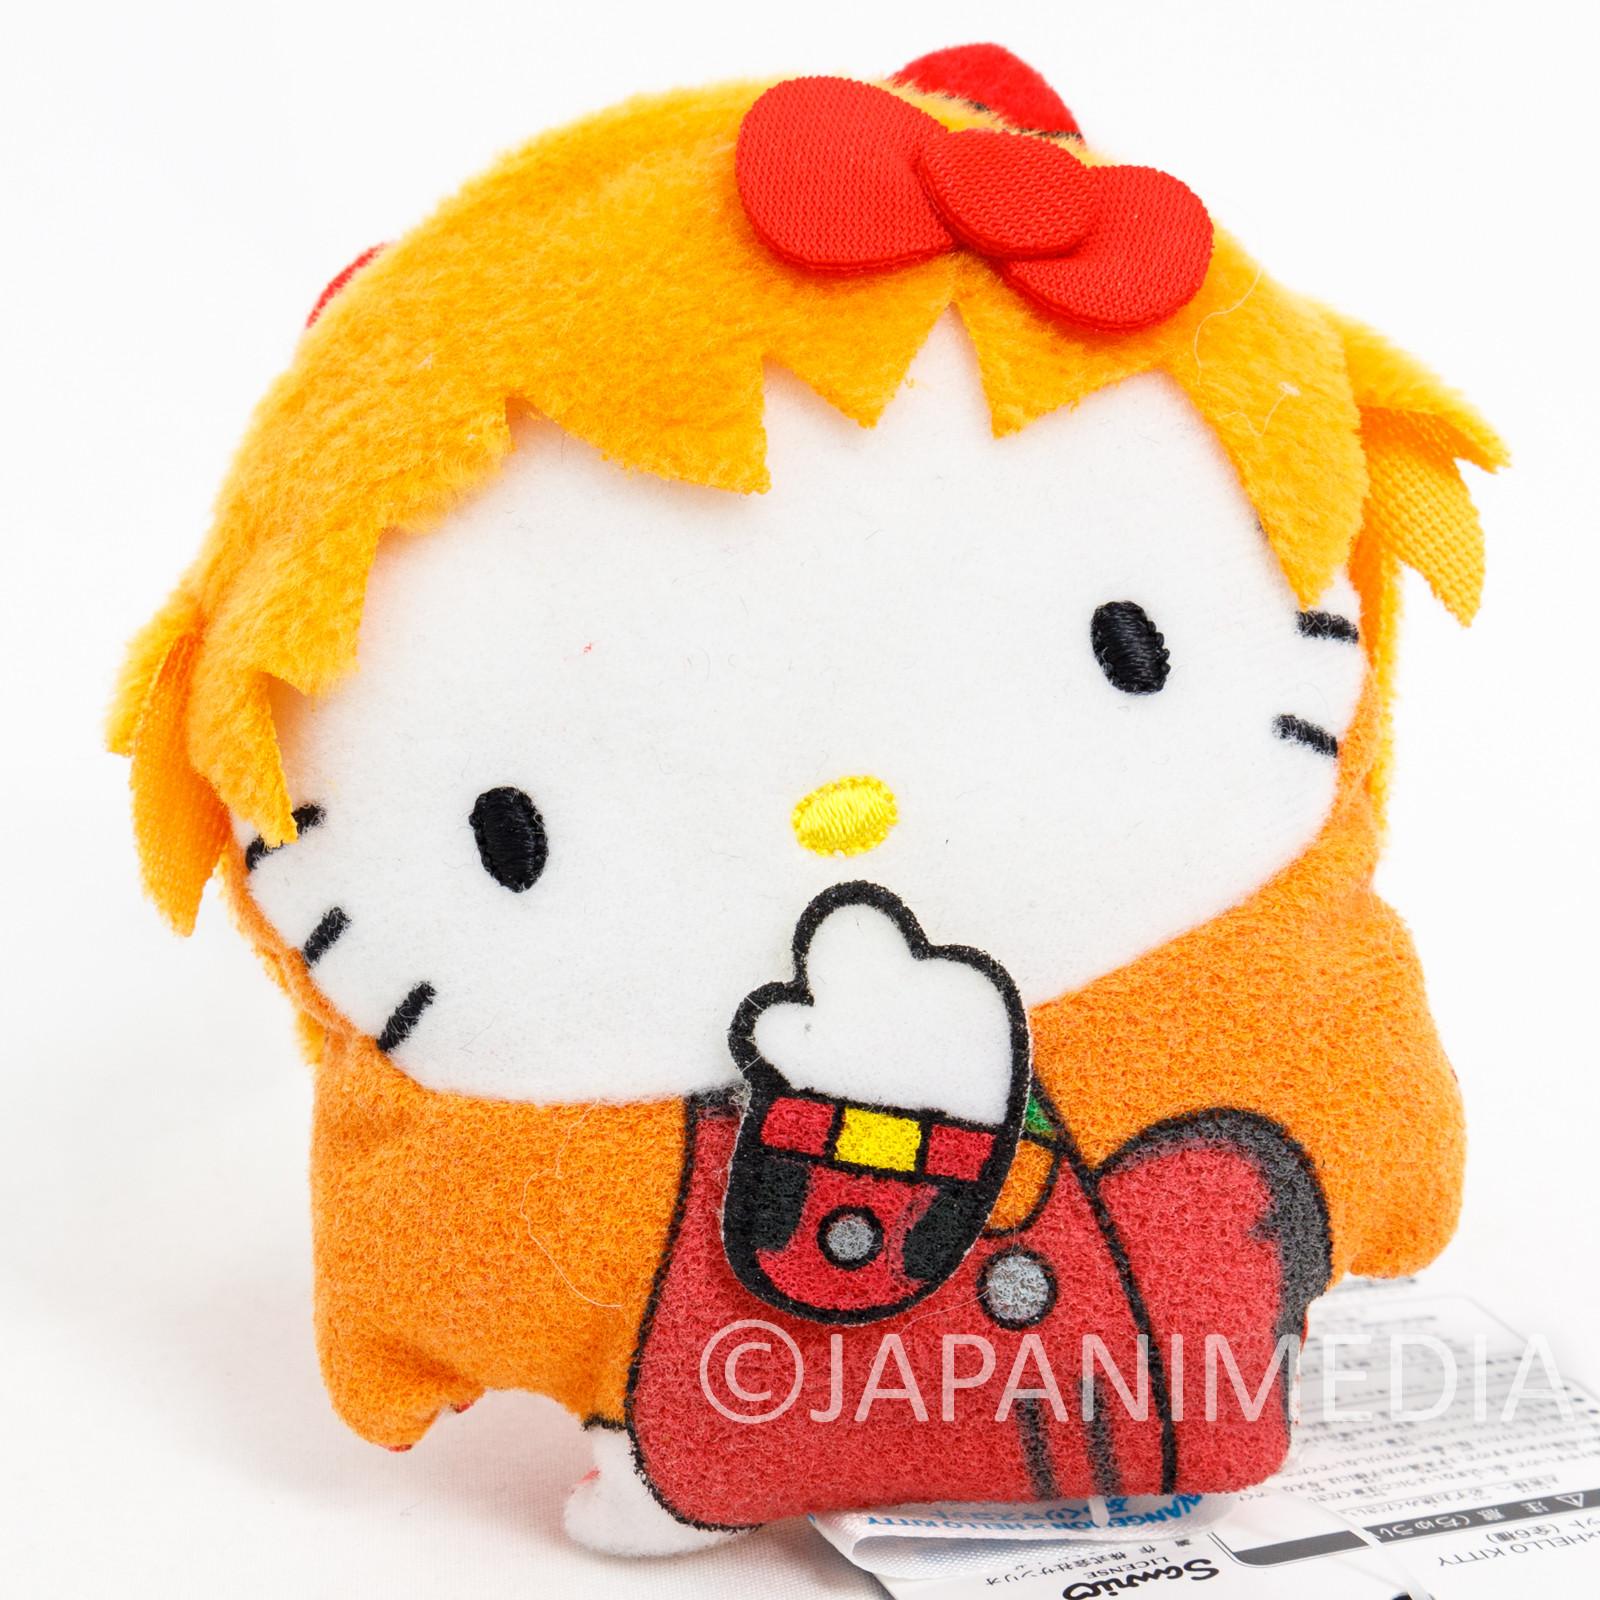 Evangelion x Hello Kitty Asuka Langley Small Plush Doll JAPAN ANIME MANGA